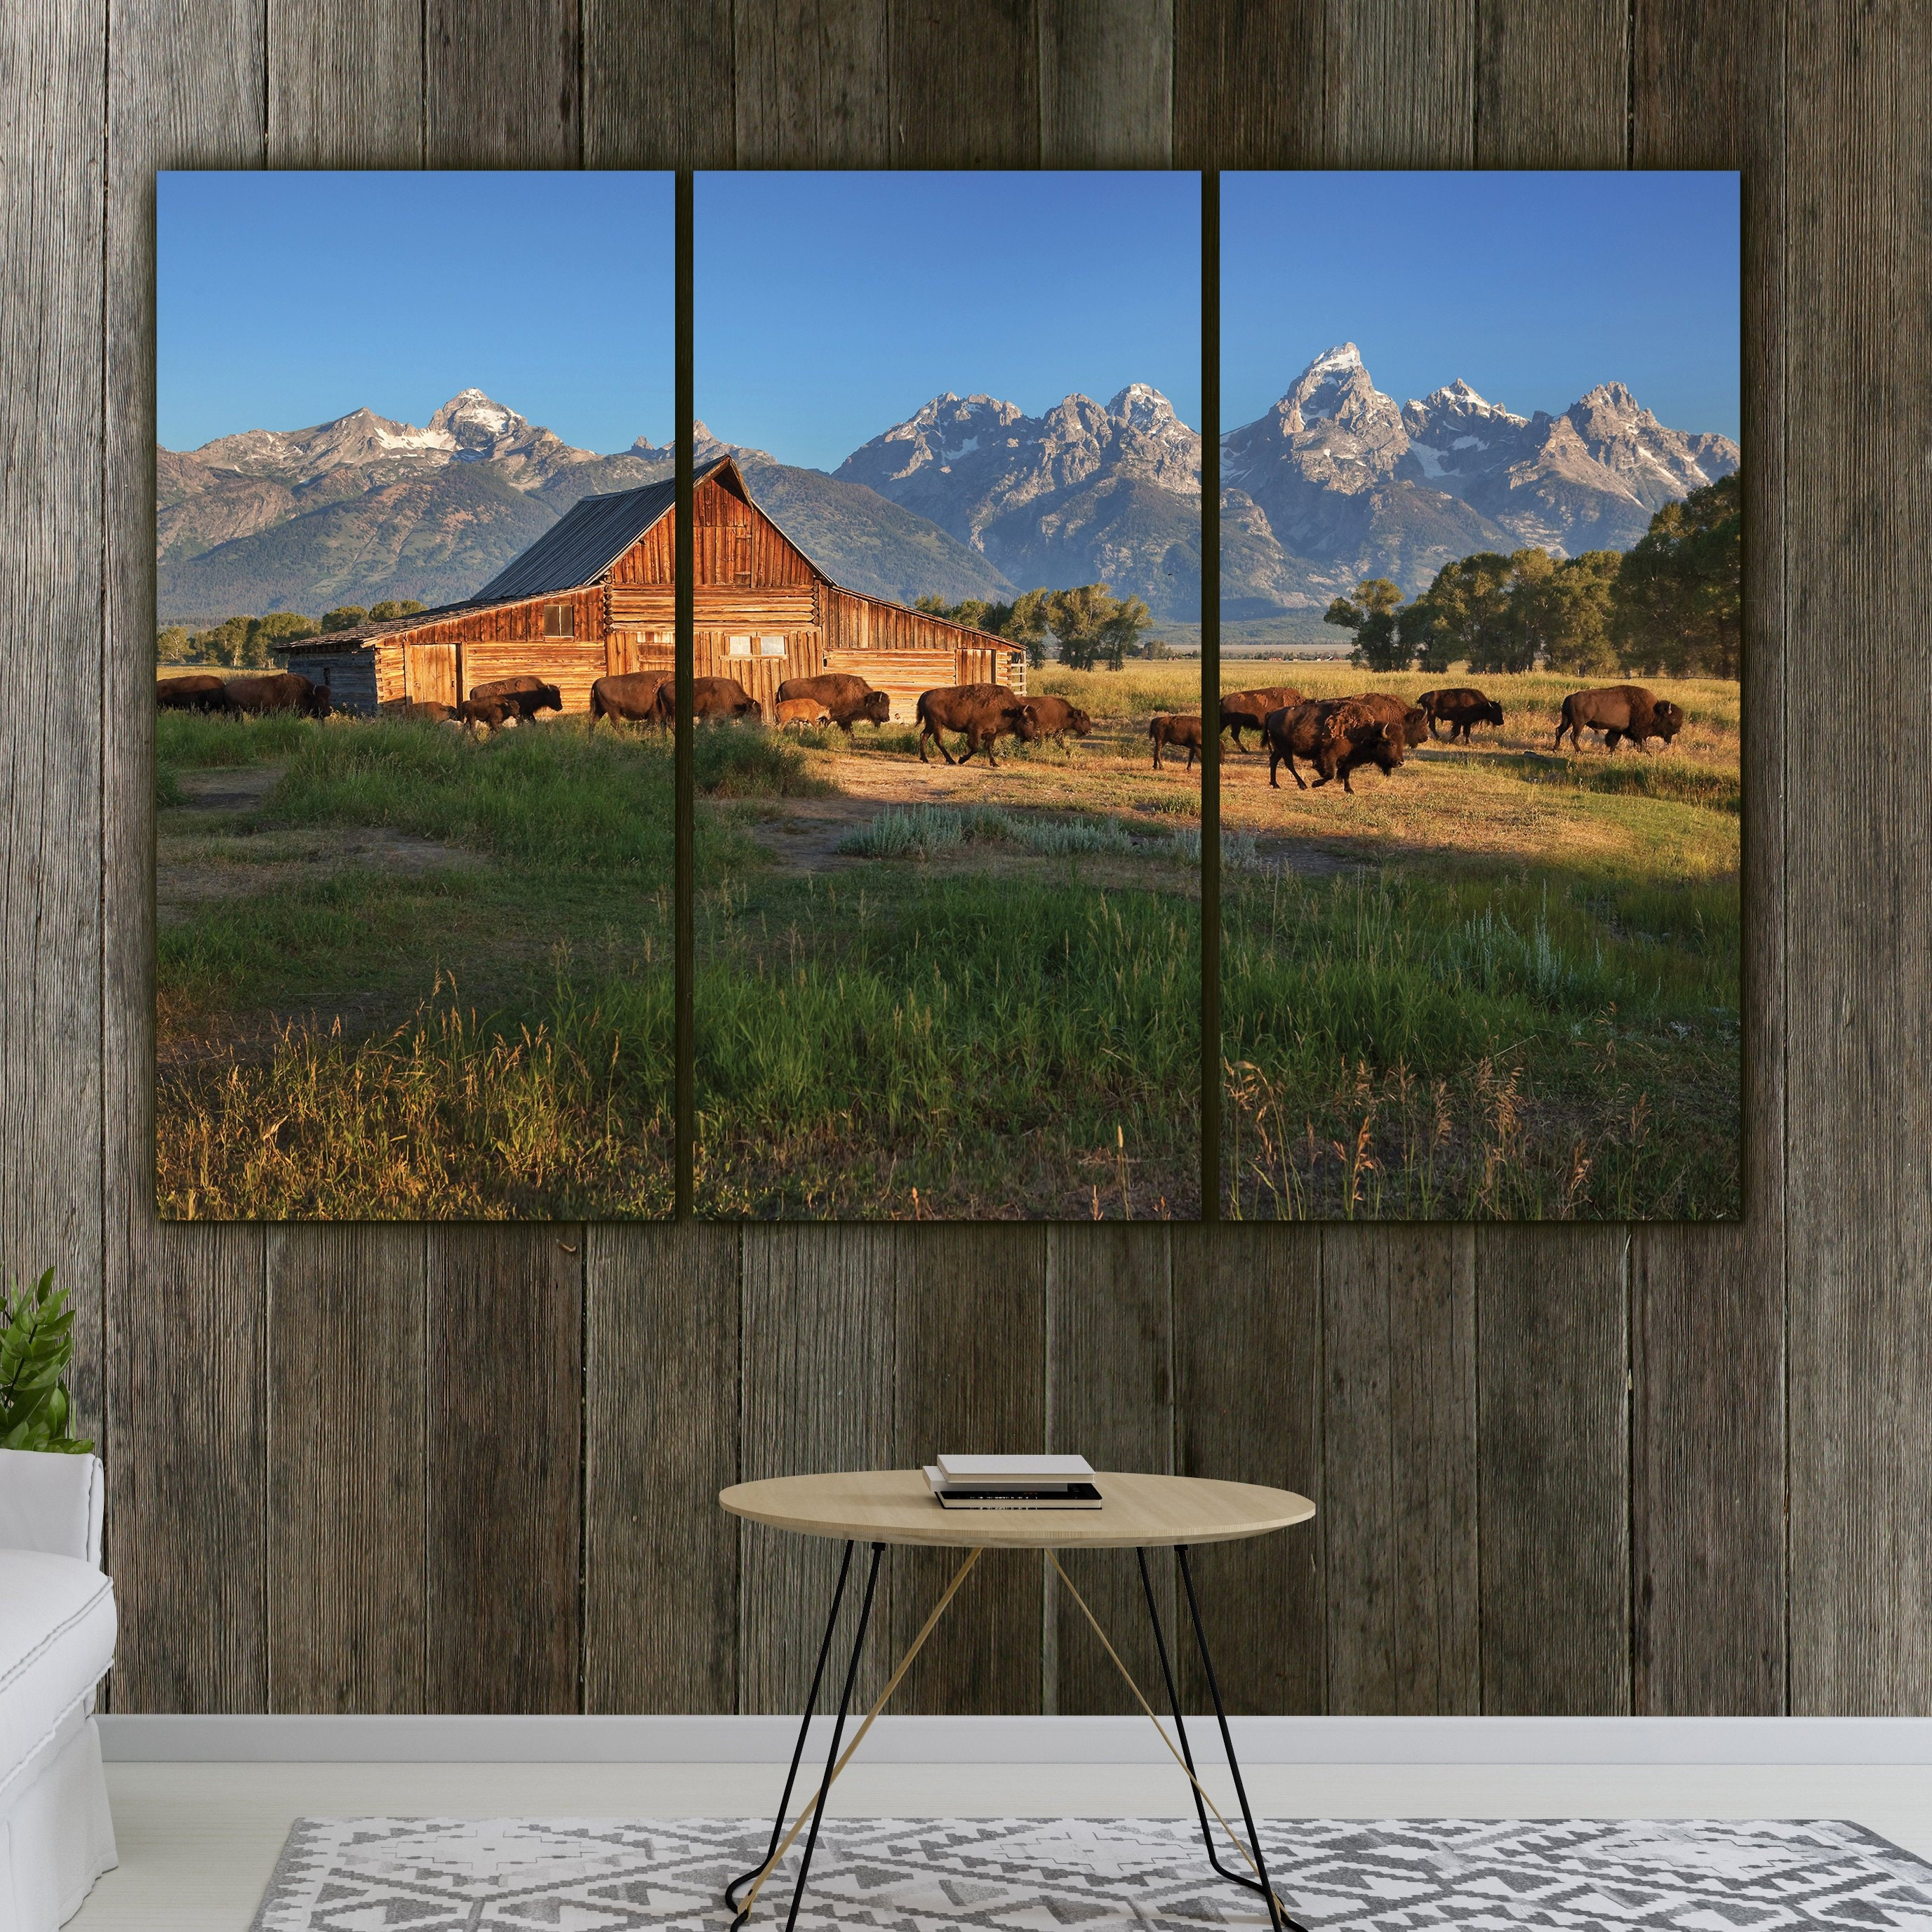 Grand Teton National Park Mountain /& Lake Landscape Scenery Wall Art Print 16x20